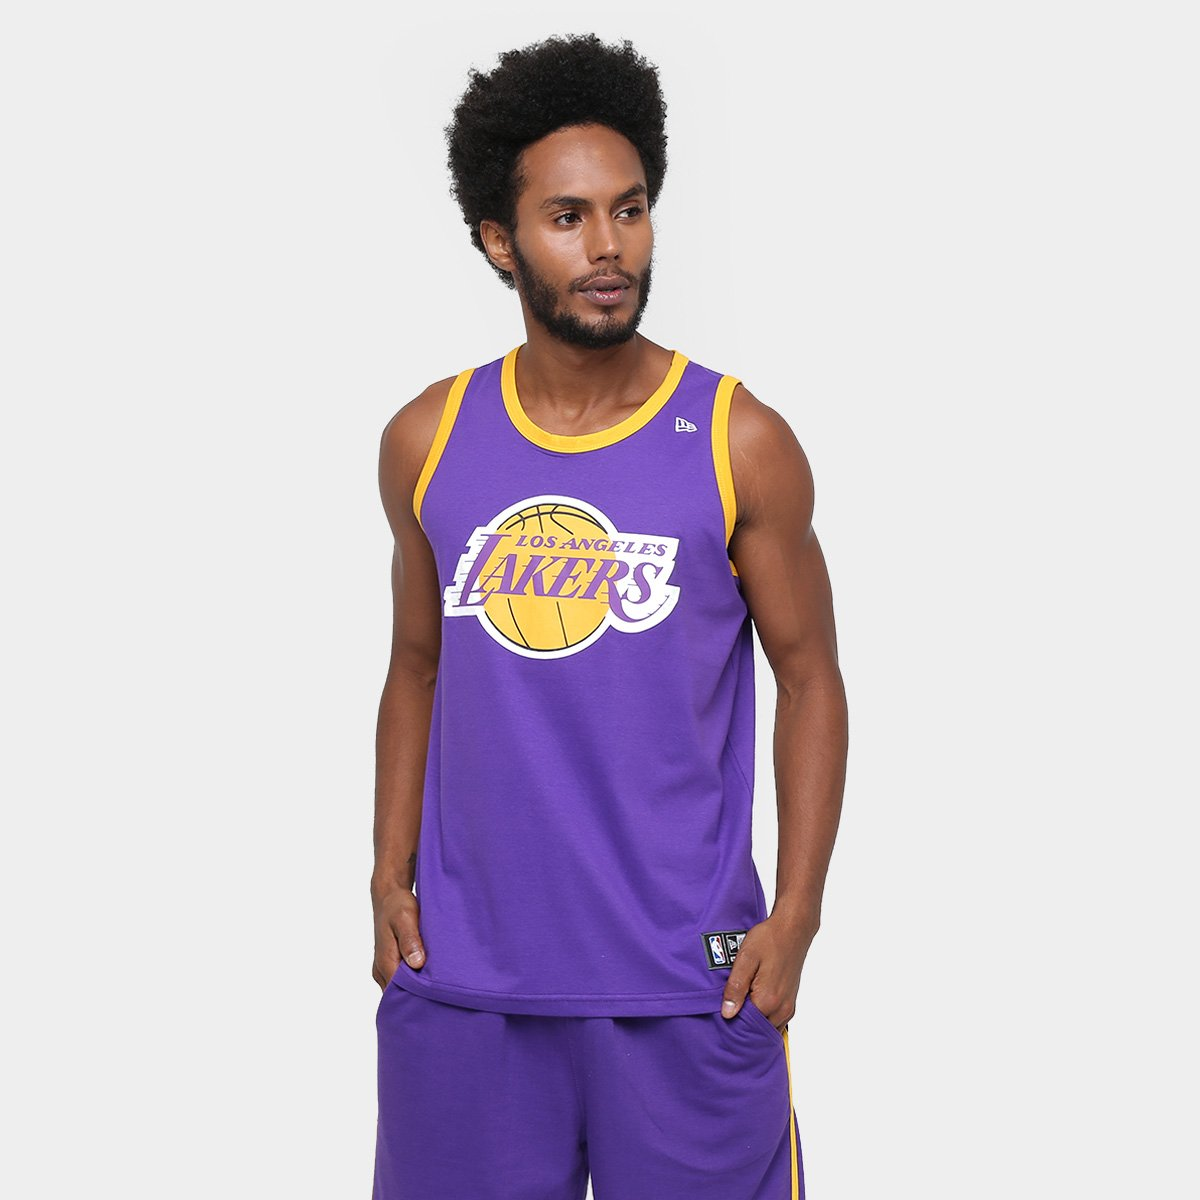 ac66ffc5d Camiseta Regata New Era NBA Basic Logo Los Angeles Lakers - Compre Agora